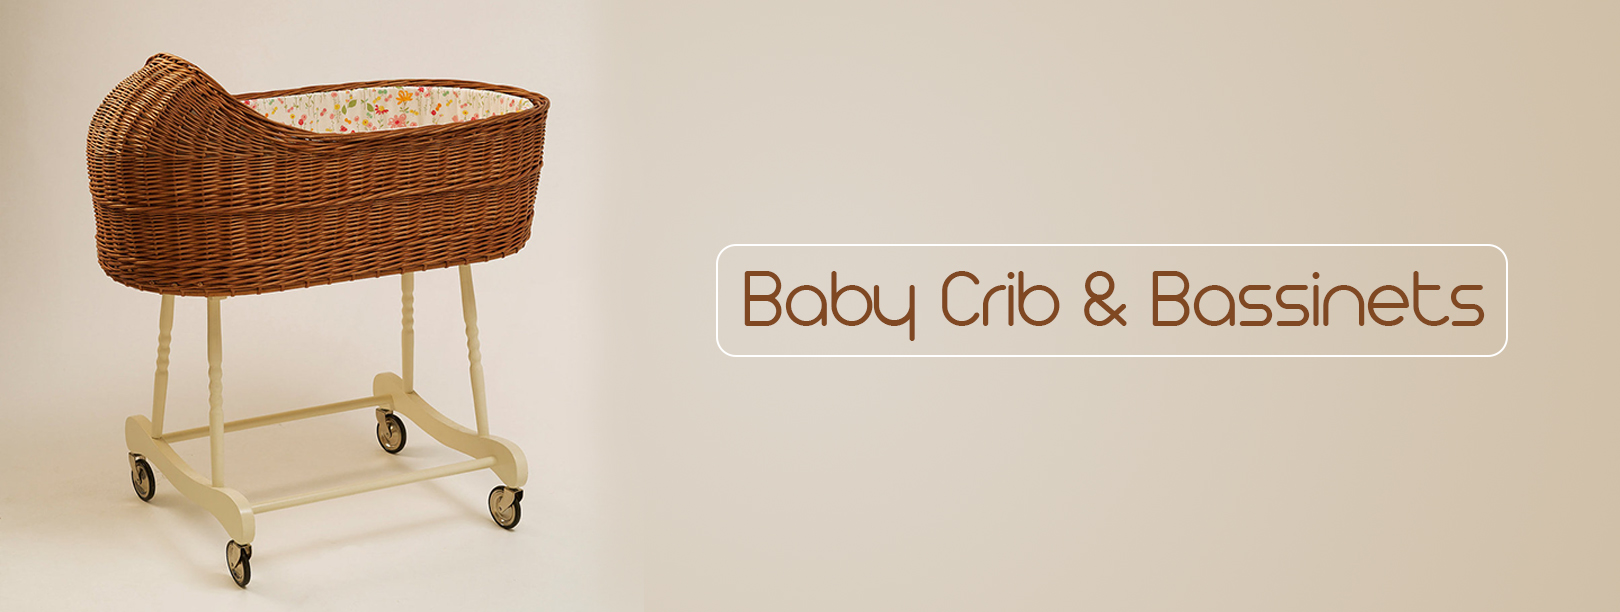 Flipkart Crib & Bassinets